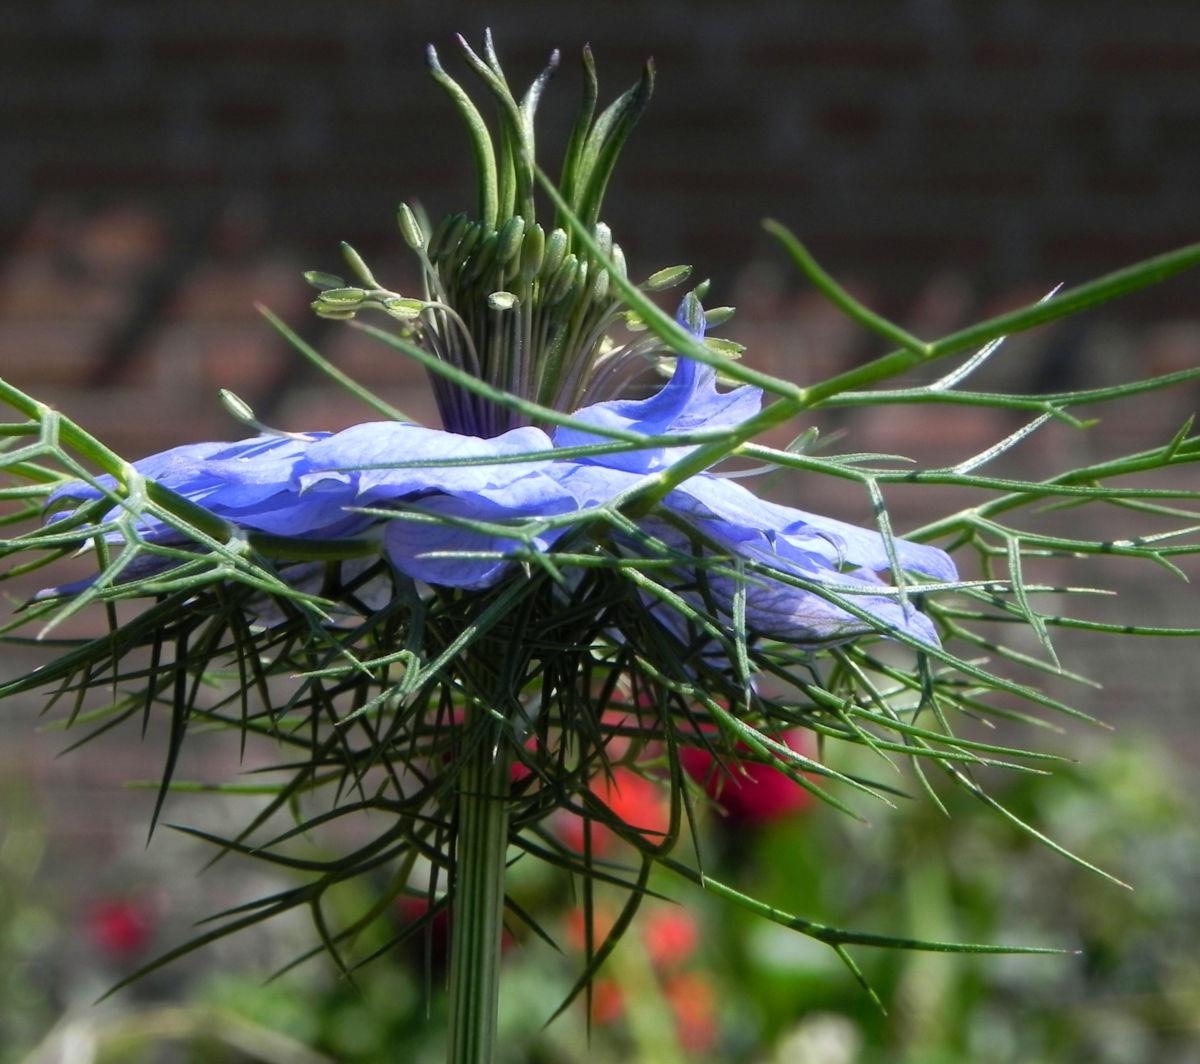 Jungfer im Gruenen Bluete hellblau Nigella damascena